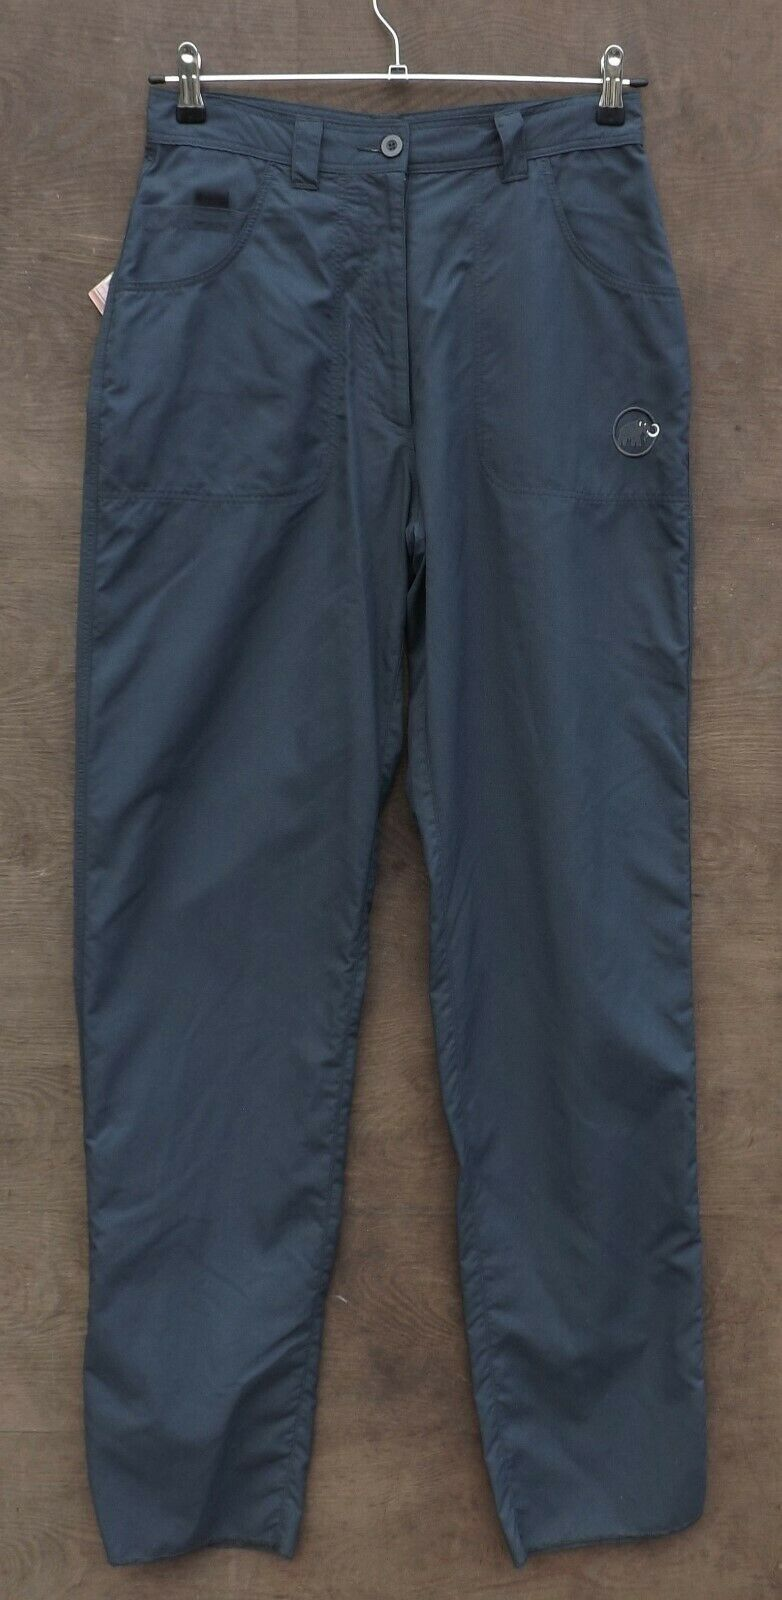 Mammut Sunrise Women's Rl Pants Very Light Ladies Outdoor Travel Pants Carbon